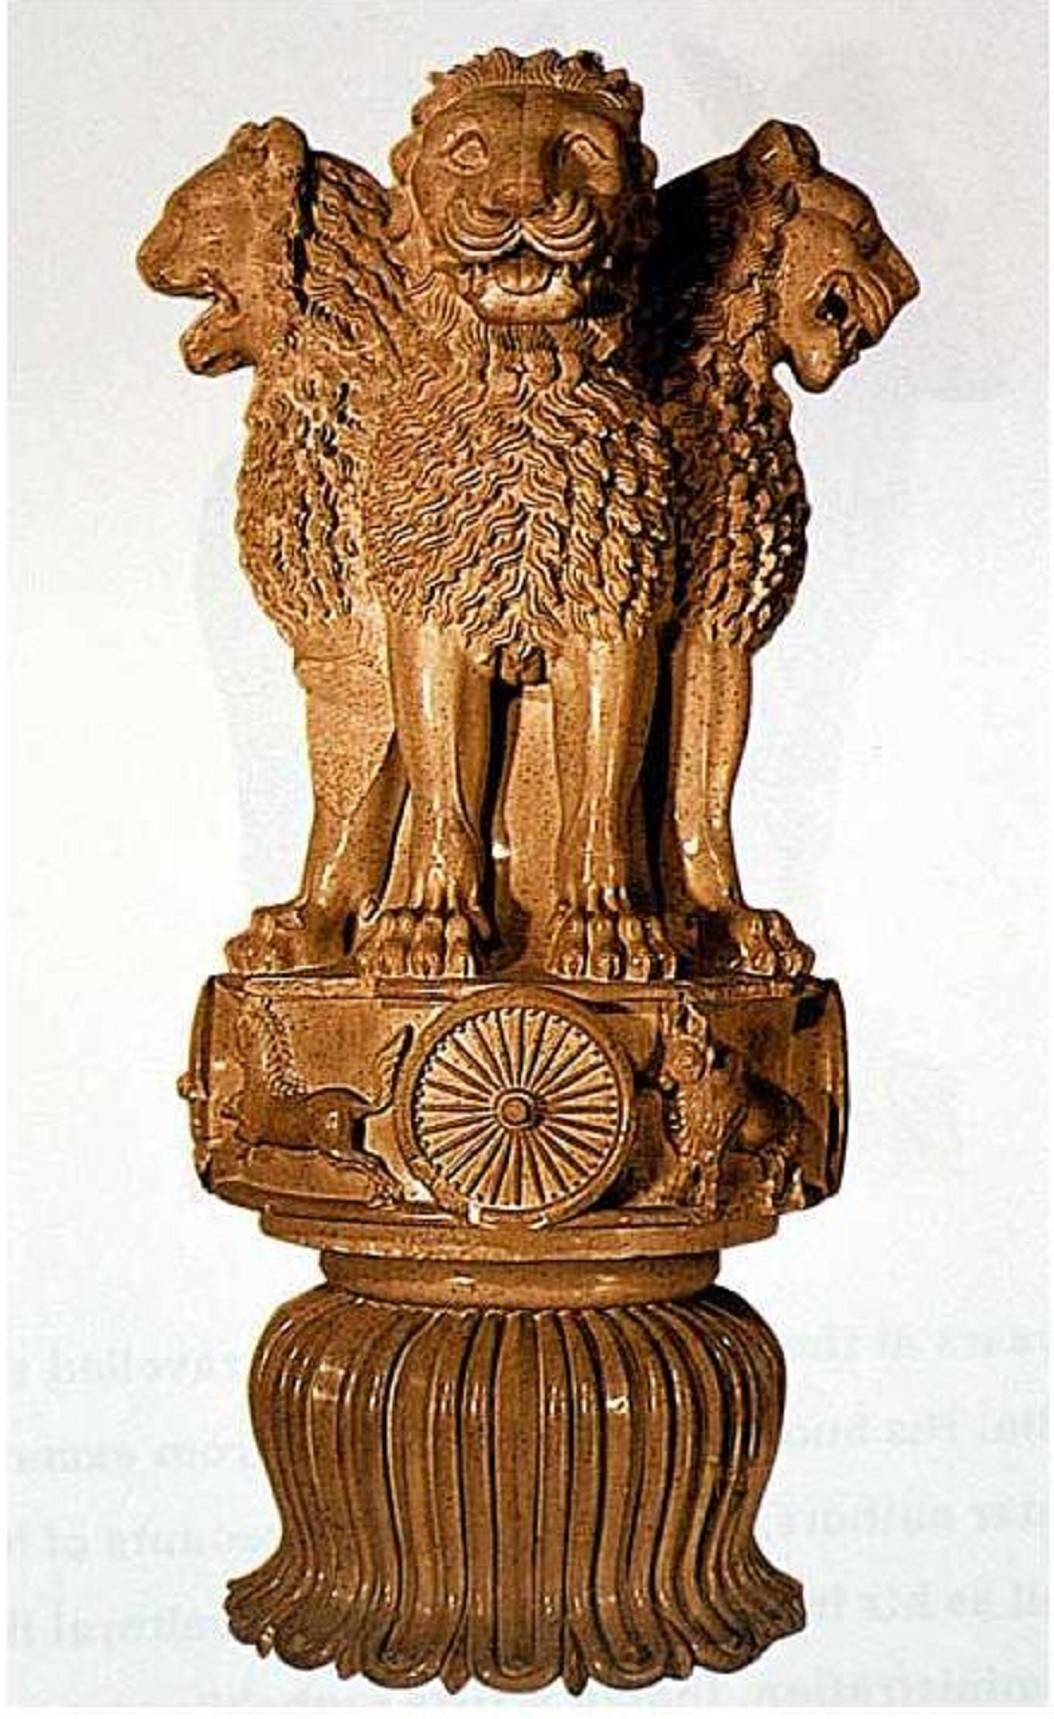 republic-day-of-india-satyamev-jayate